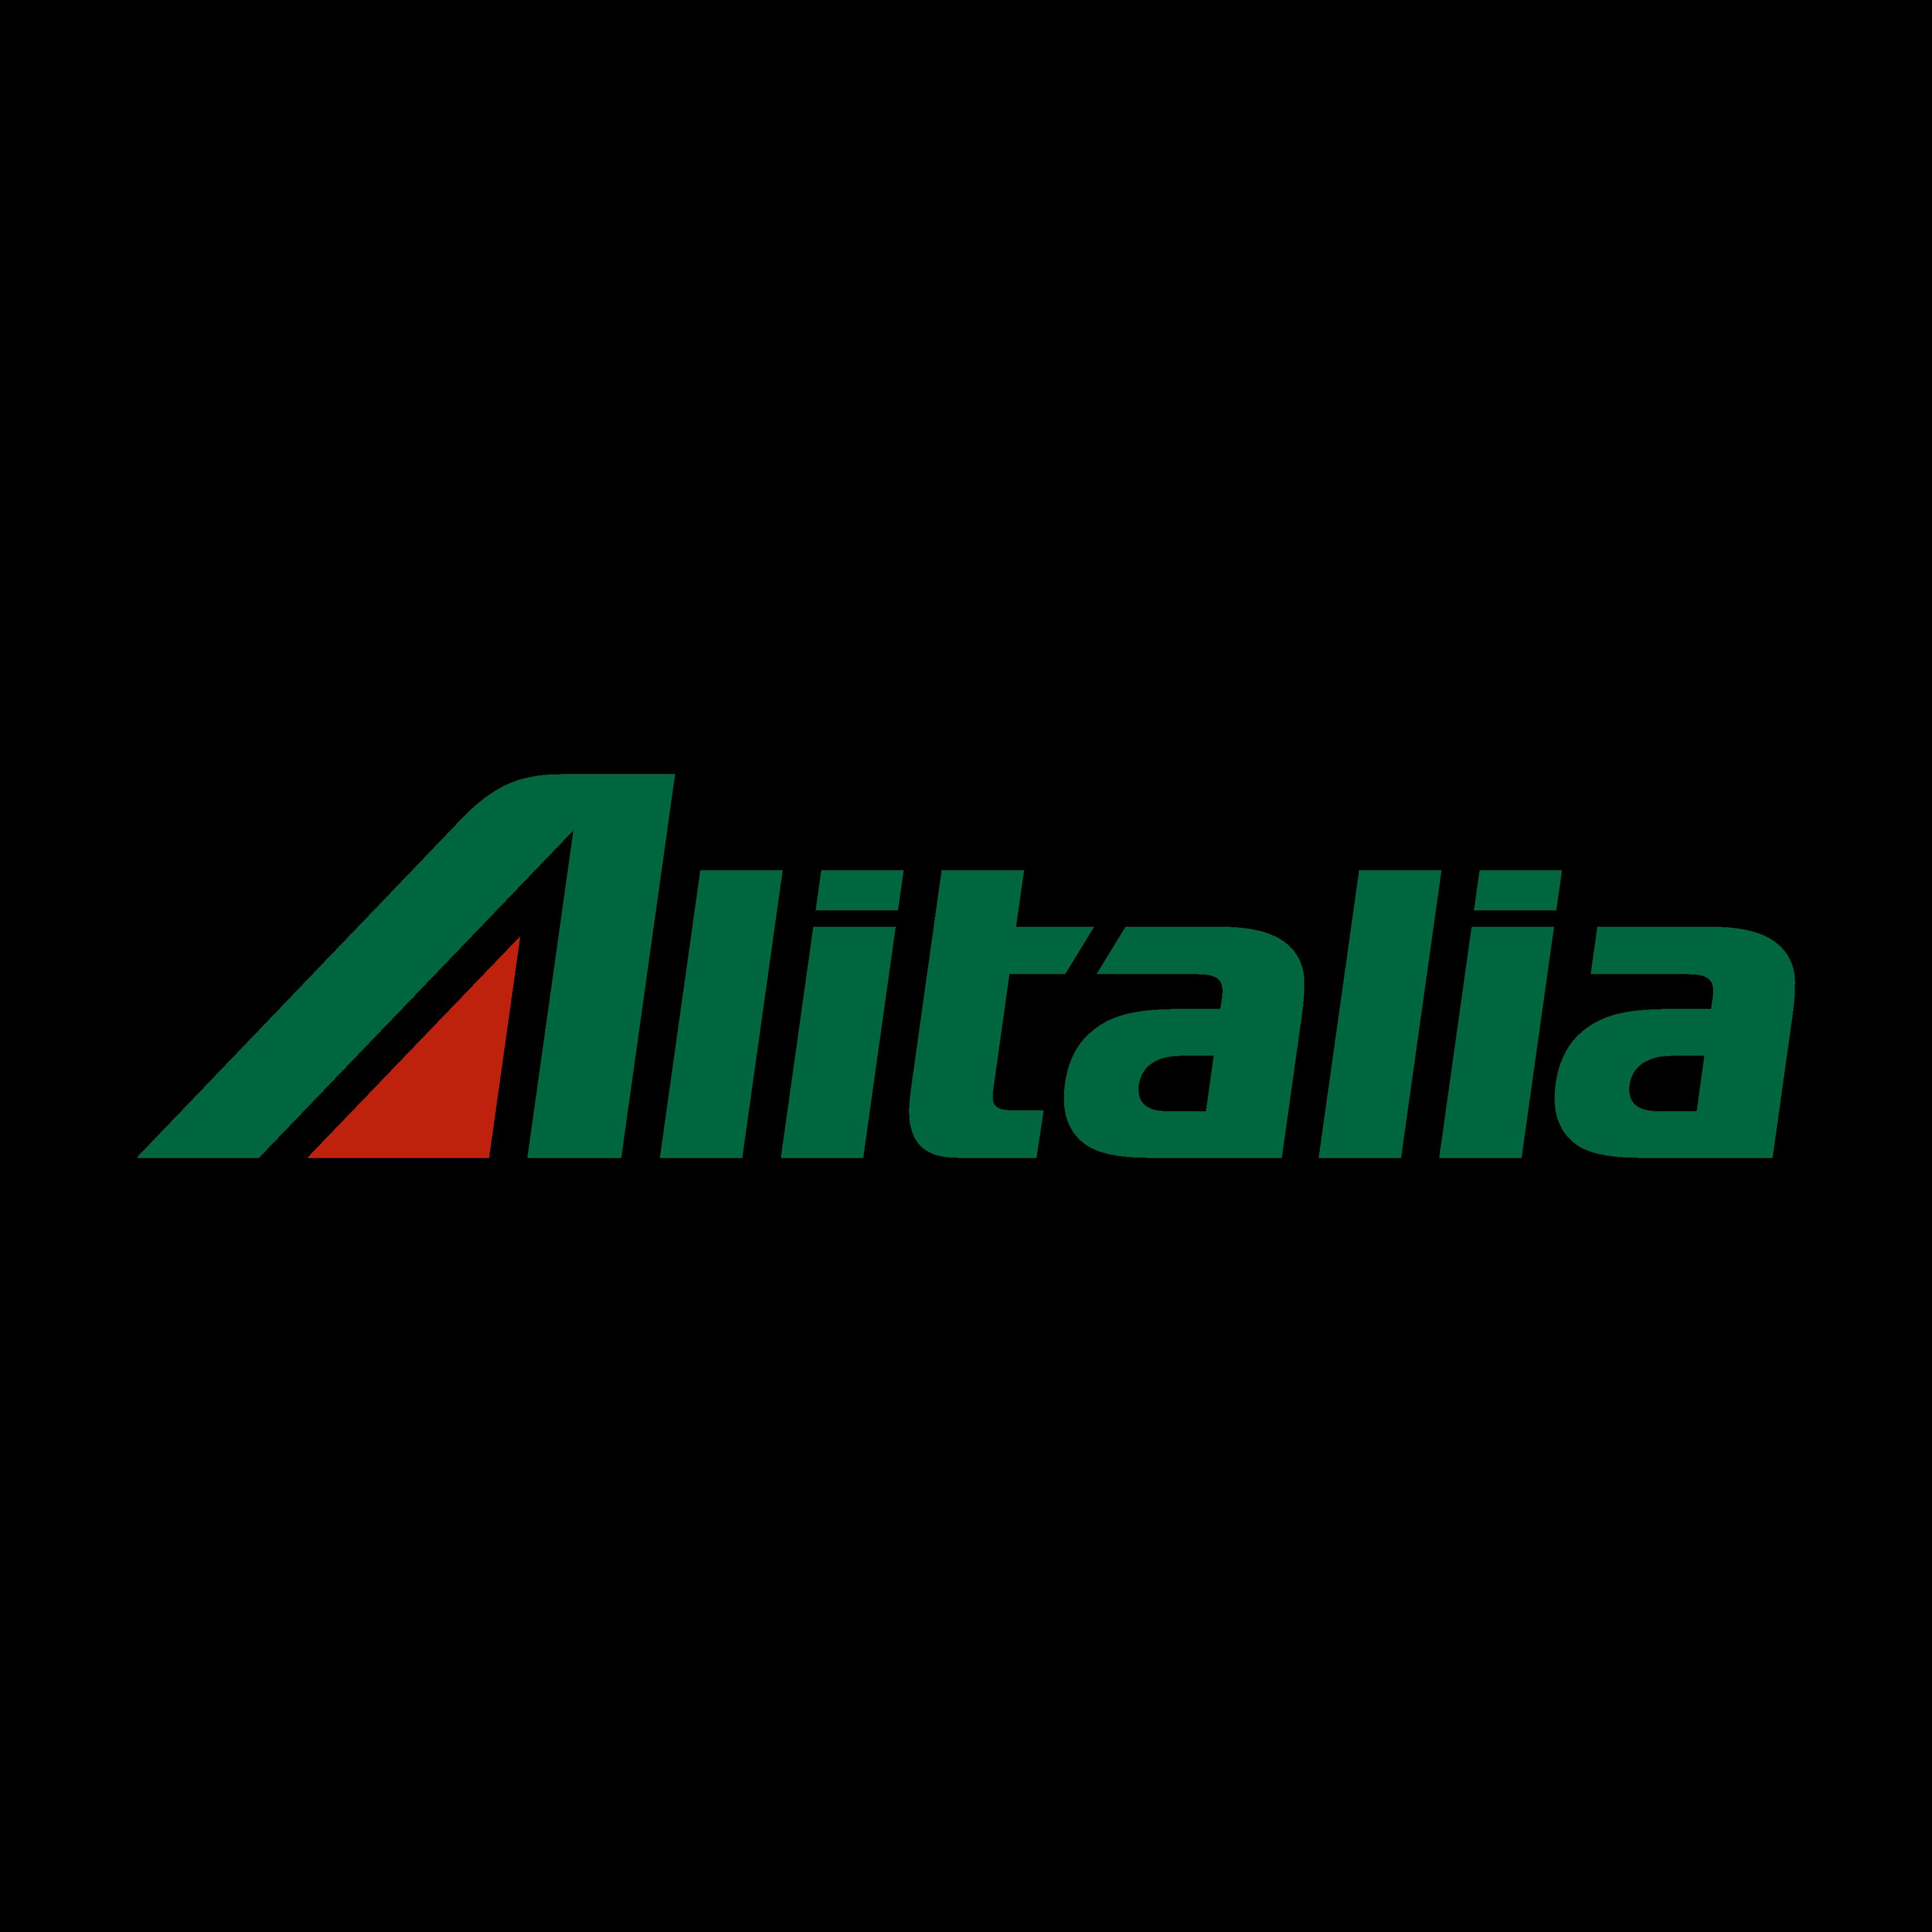 alitalia logo 0 - Alitalia Logo